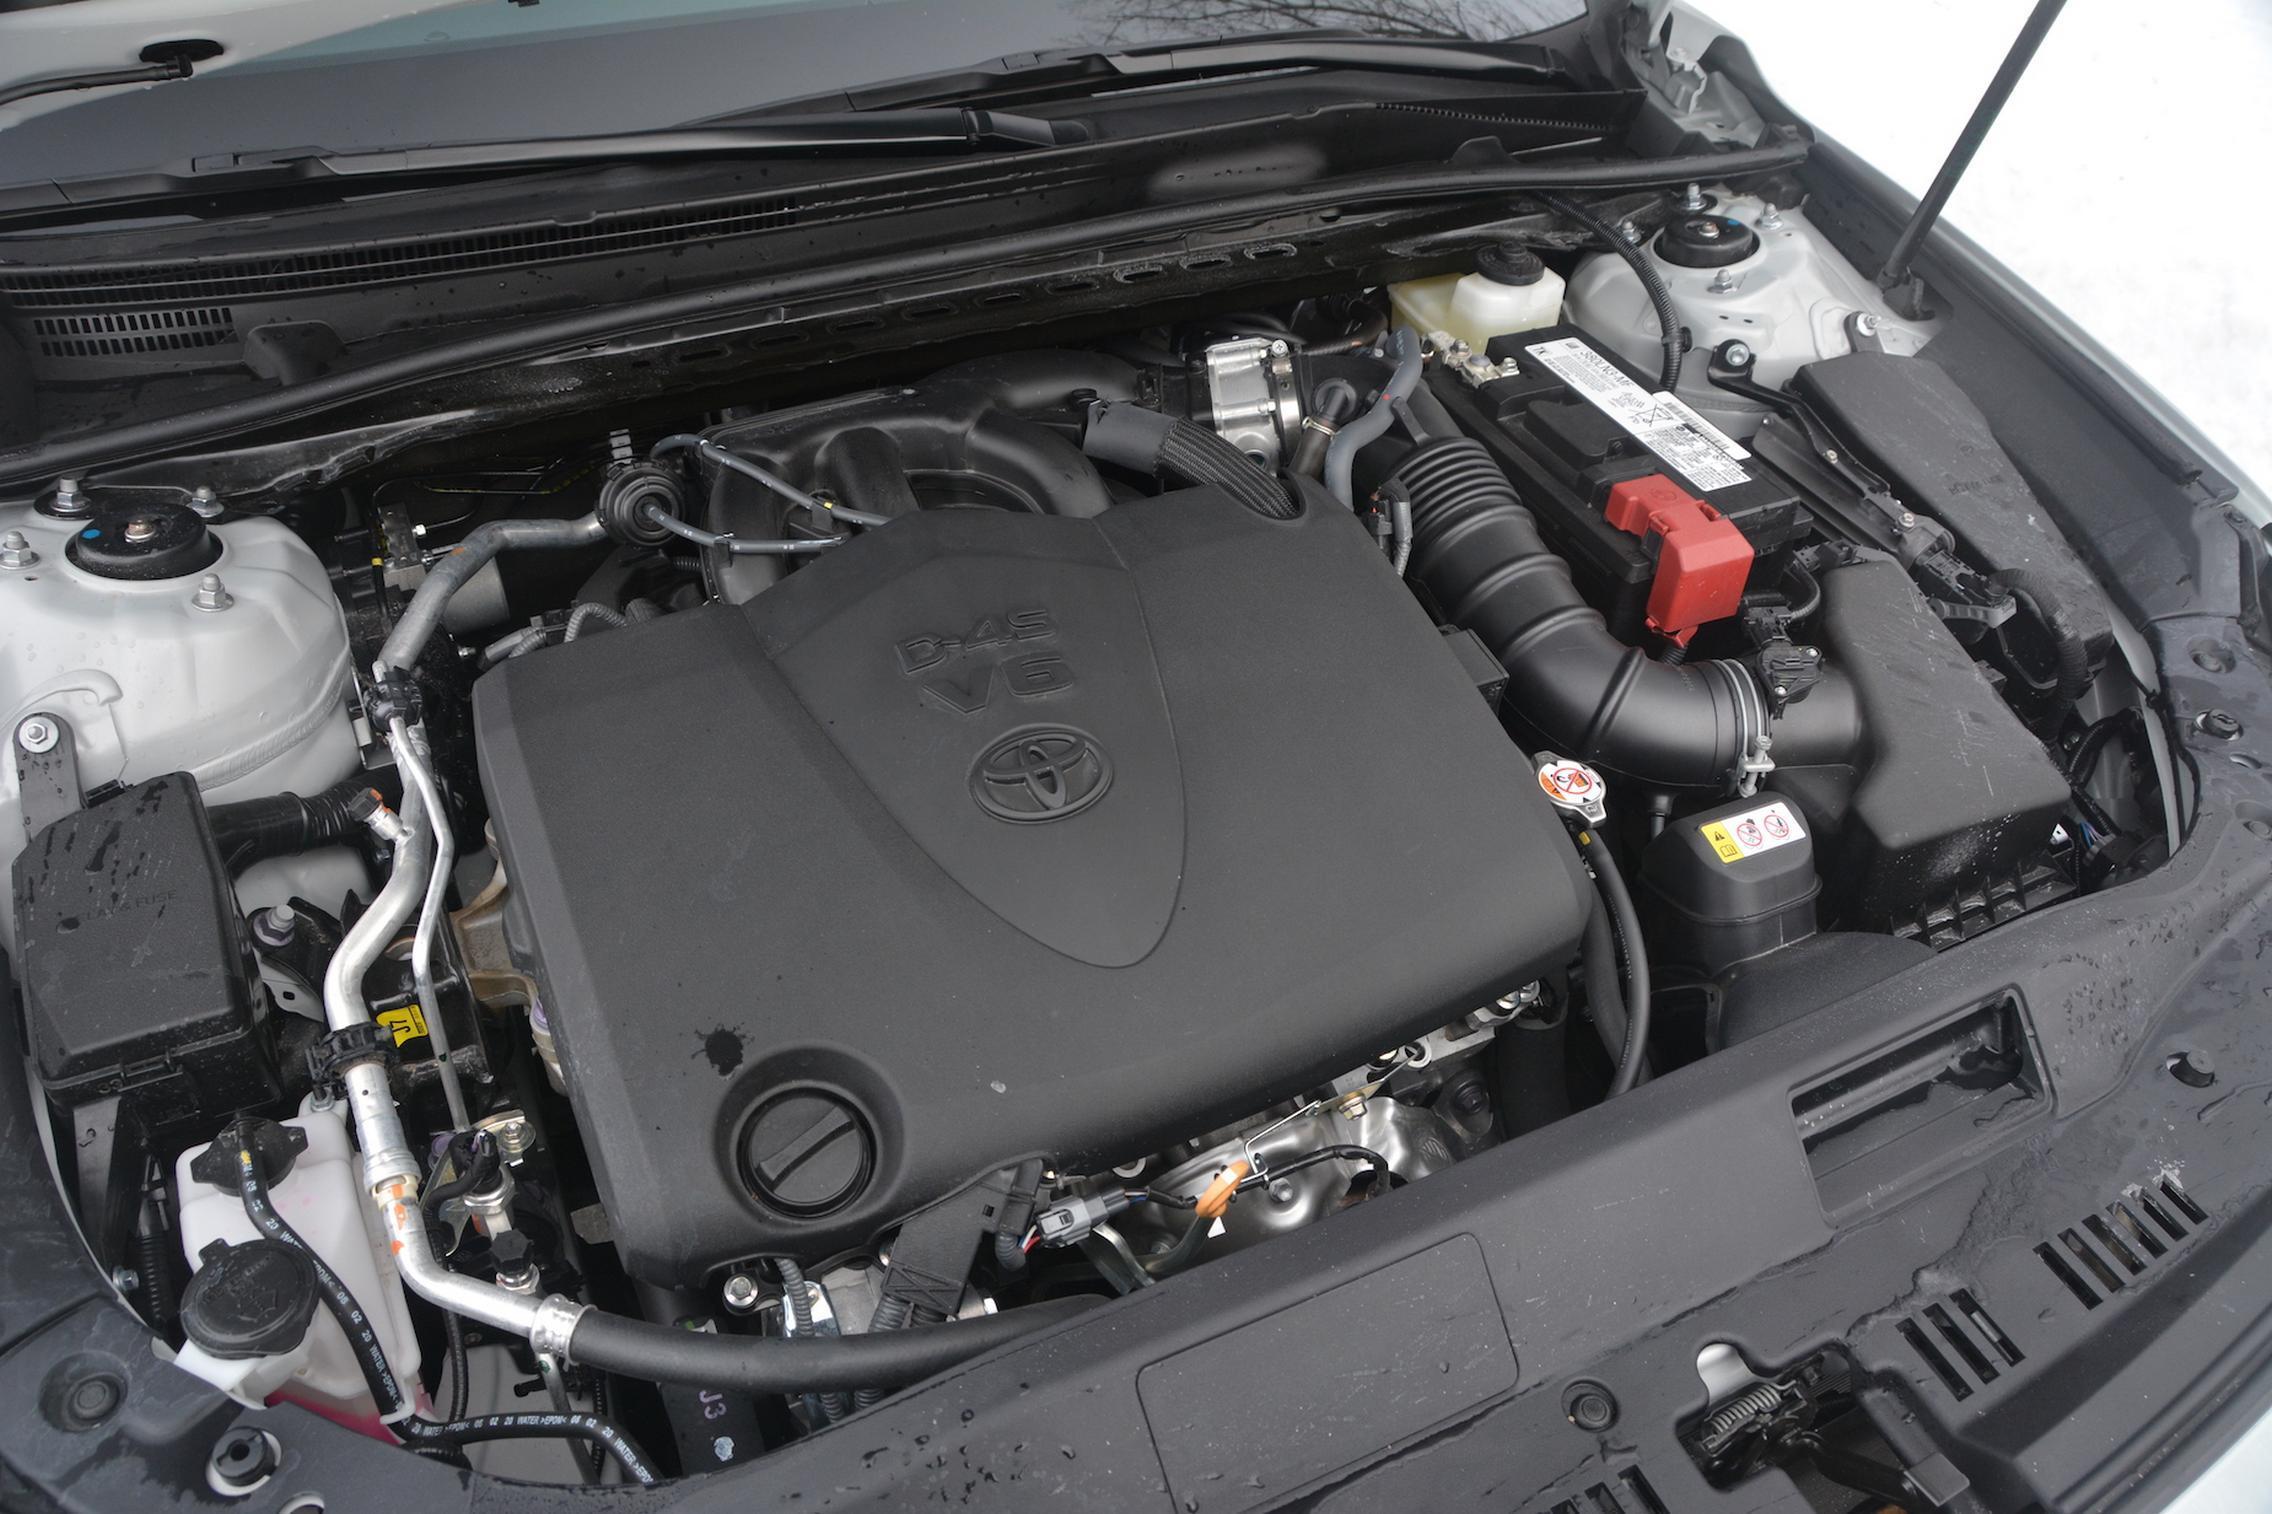 Toyota Avalon TRD engine